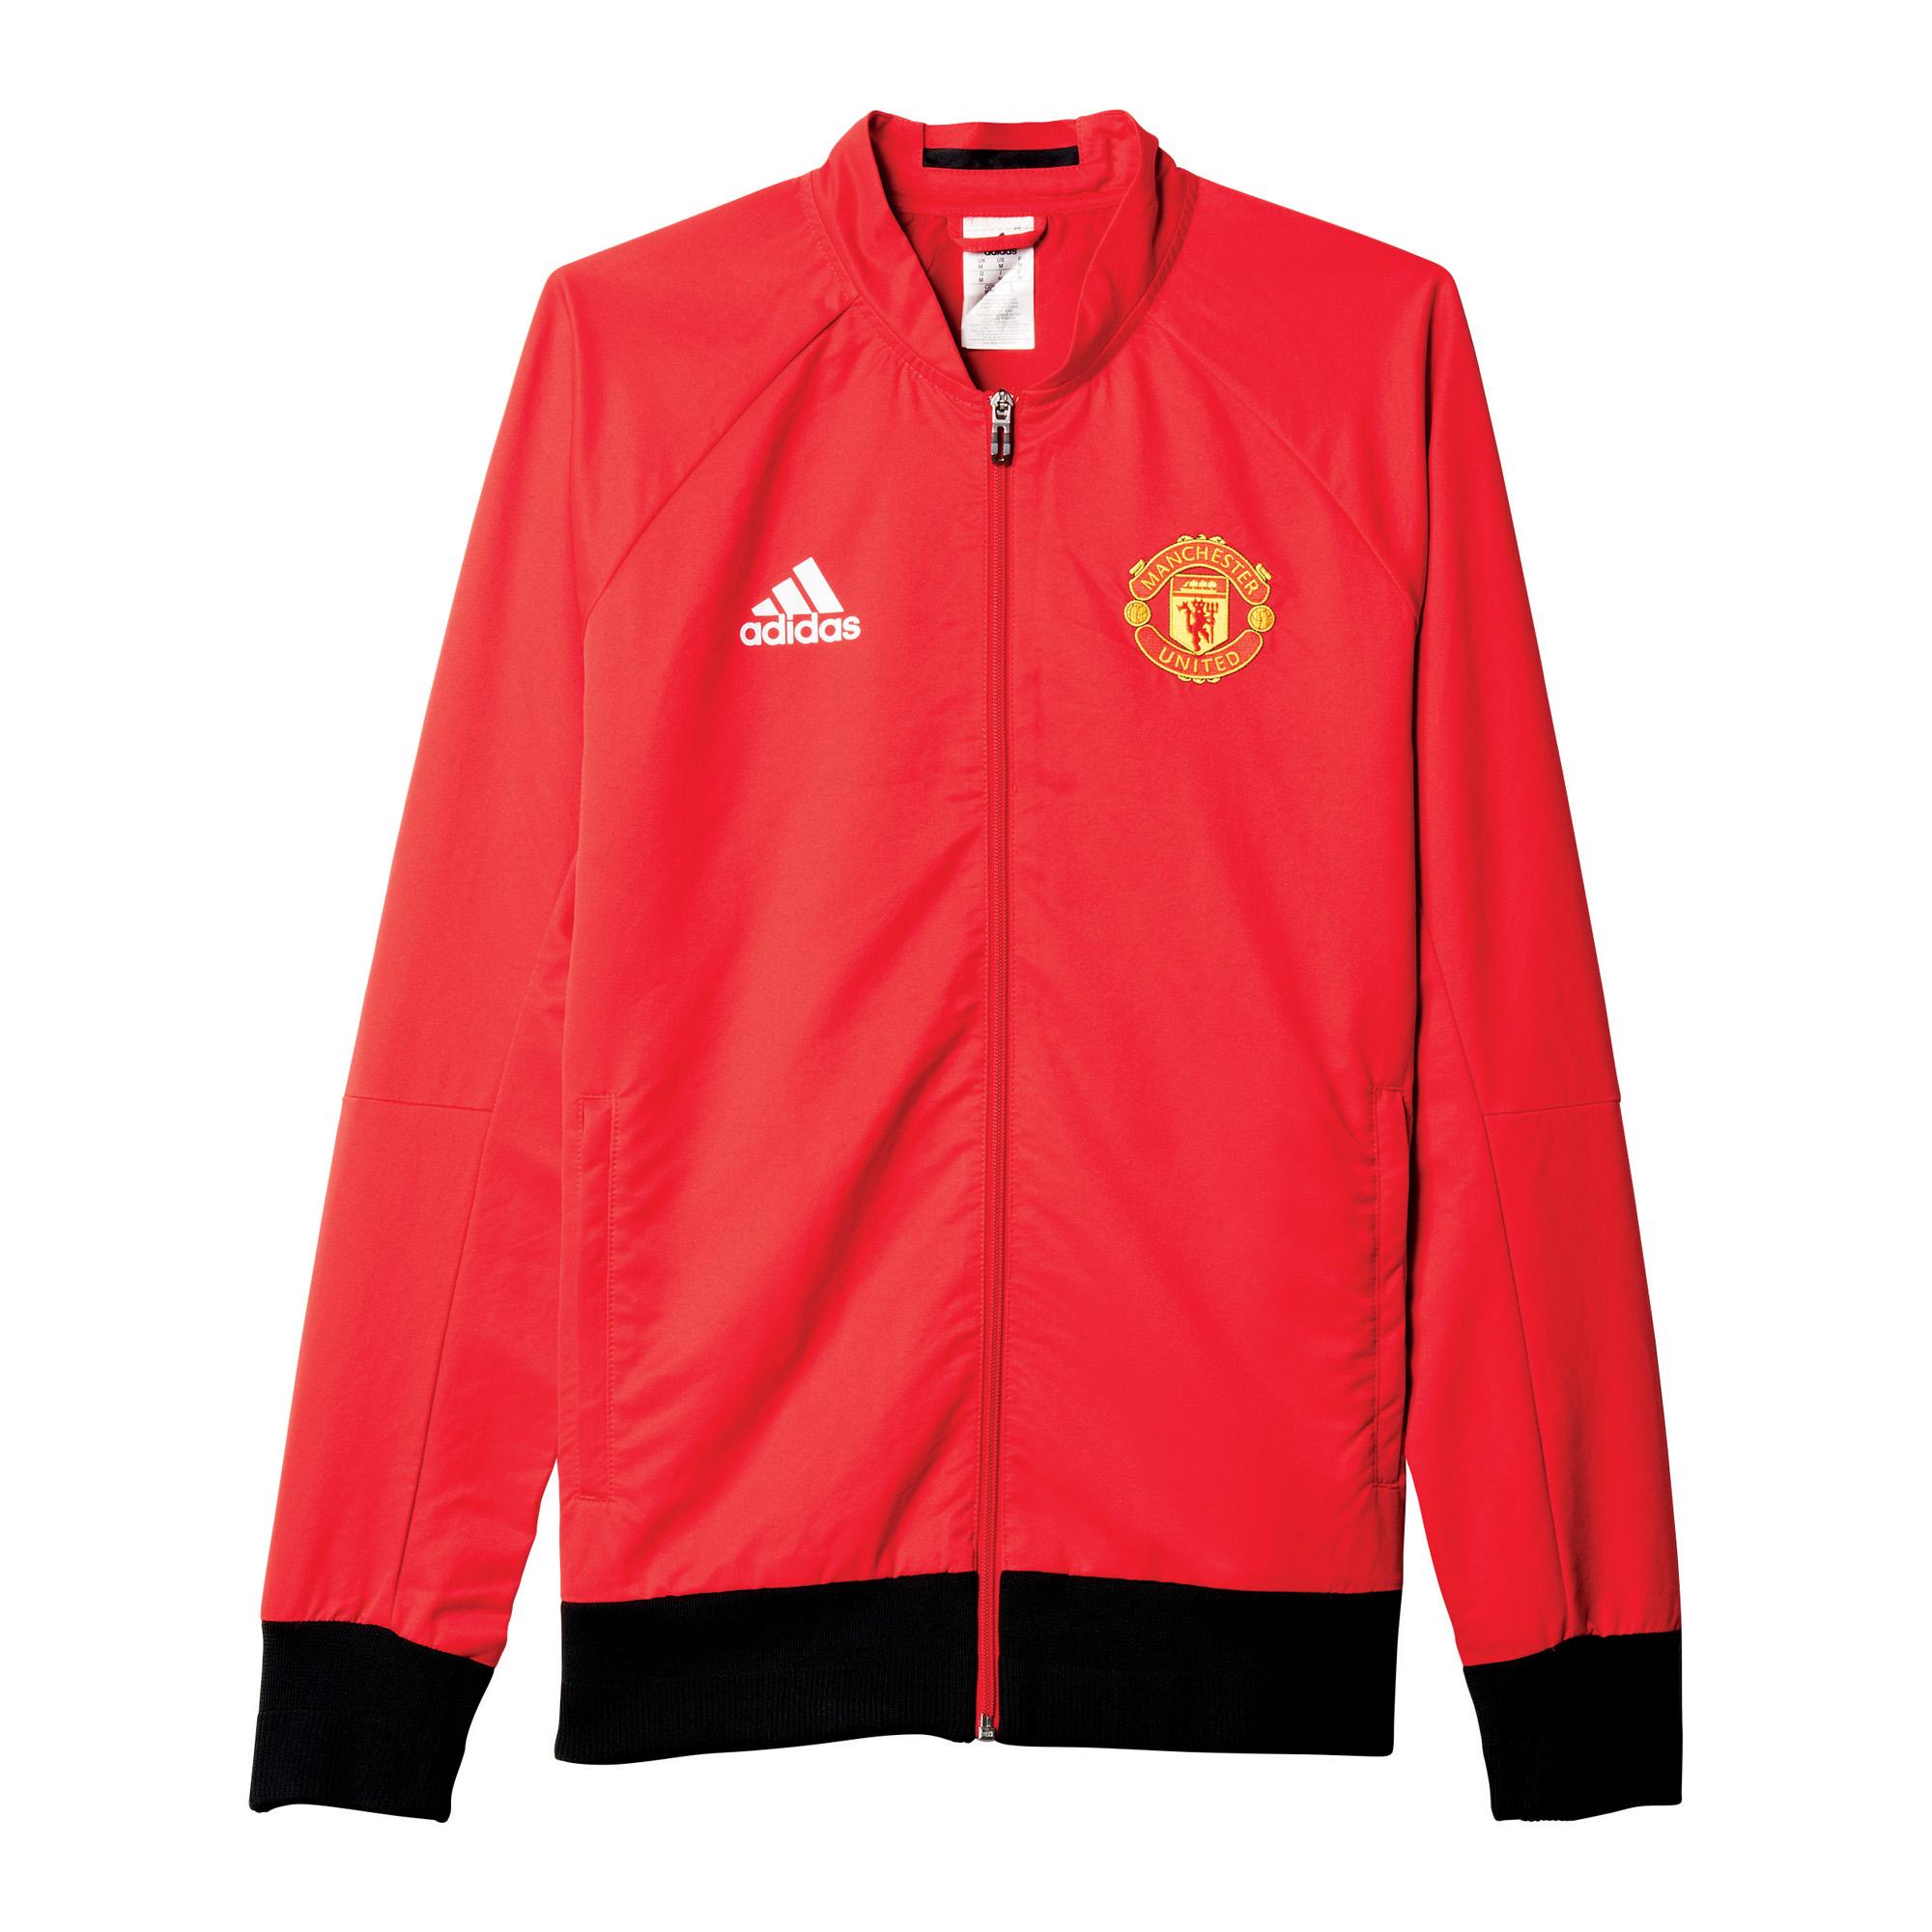 adidas Herren Manchester United Woven Anthem Jacke 2015/16 AI5401 S